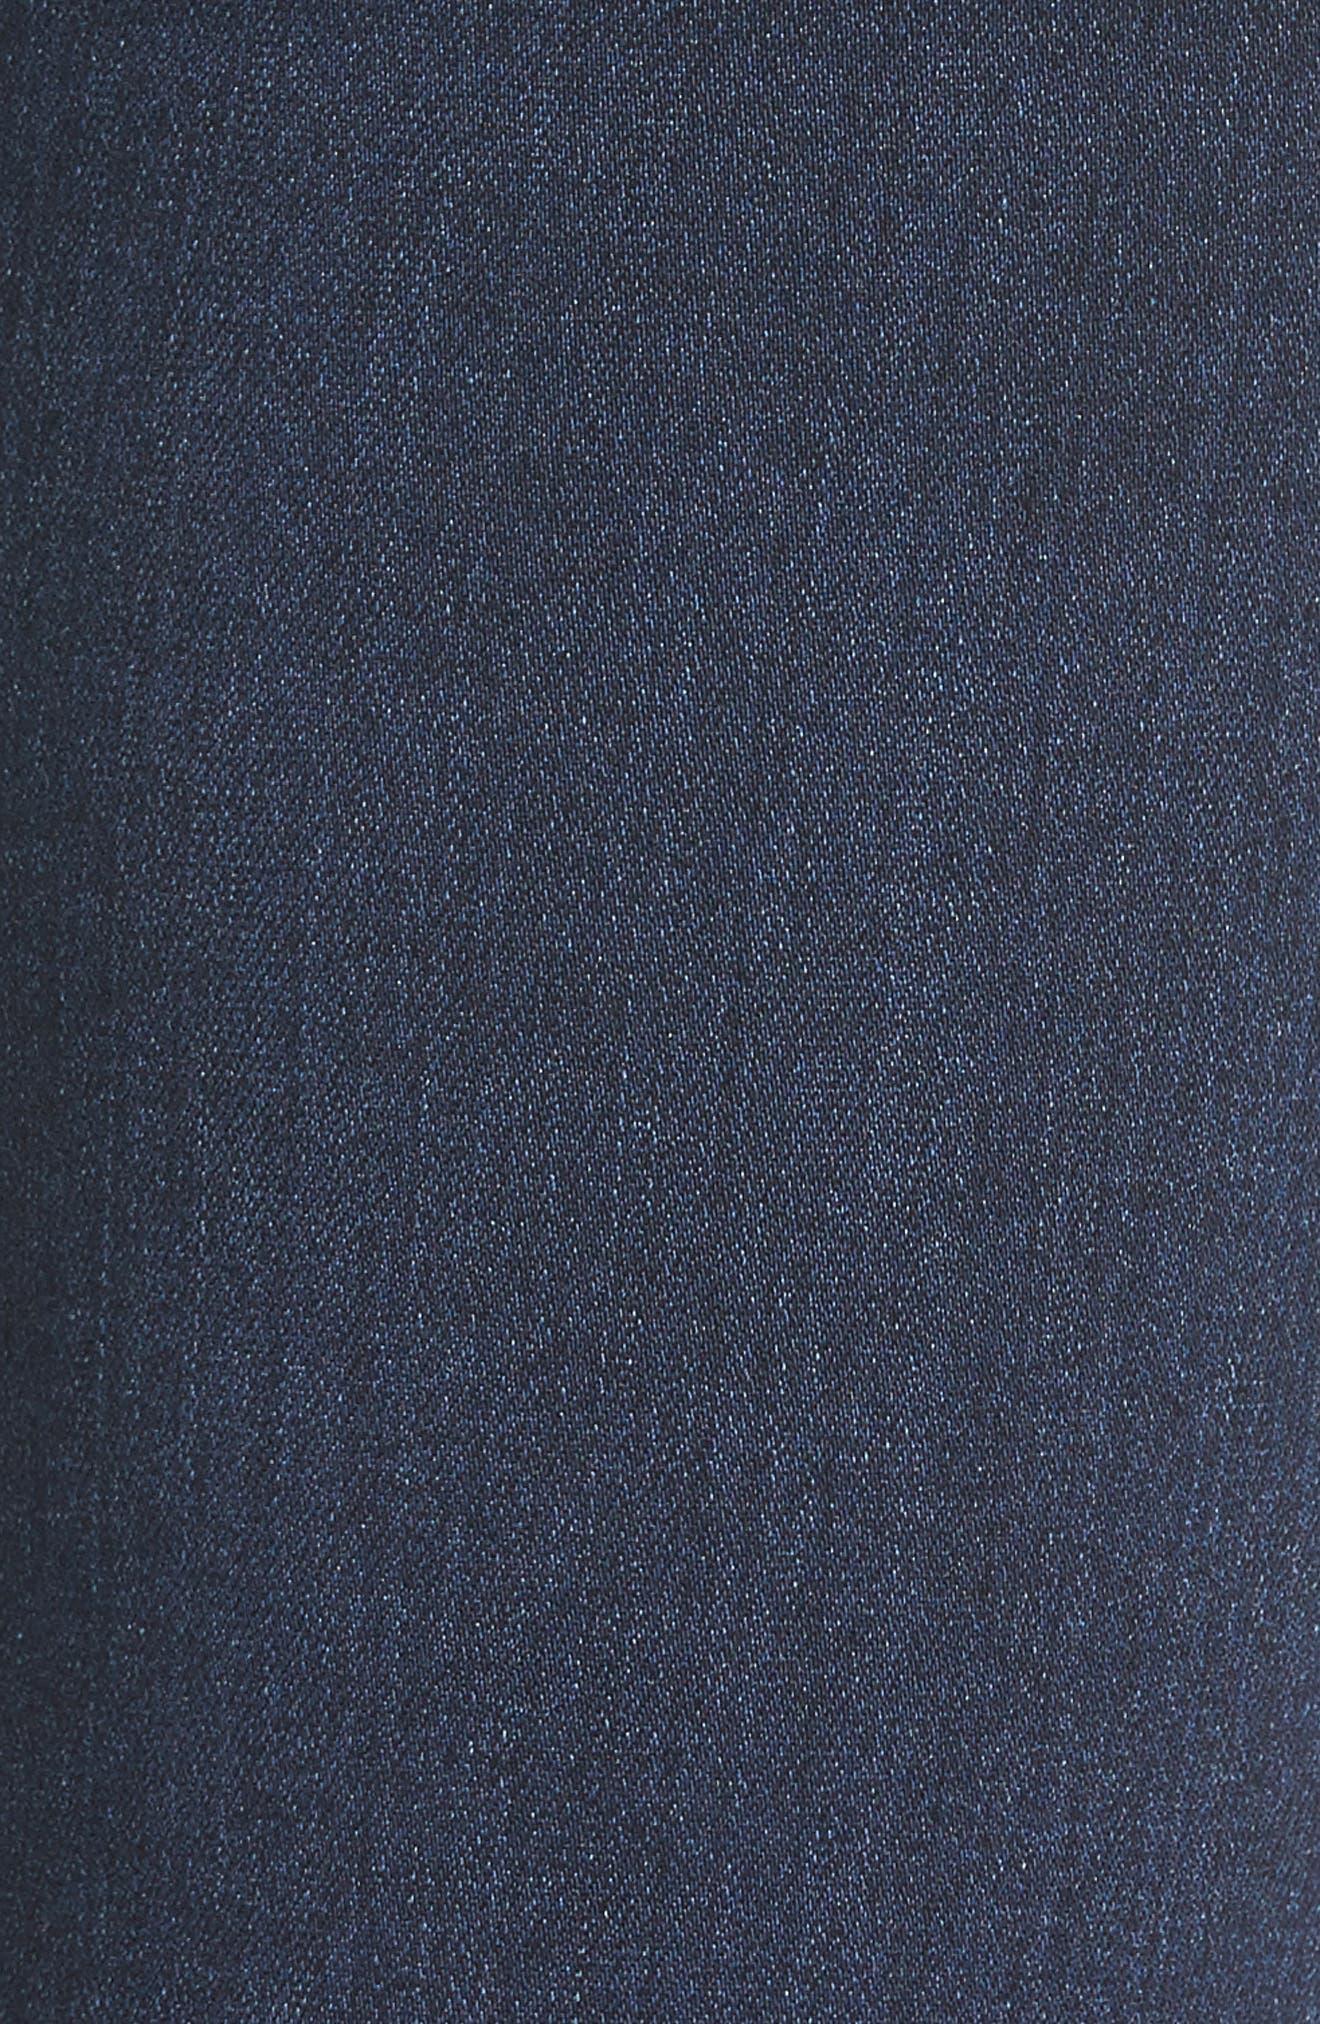 Transcend Skyline Skinny Jeans,                             Alternate thumbnail 3, color,                             400